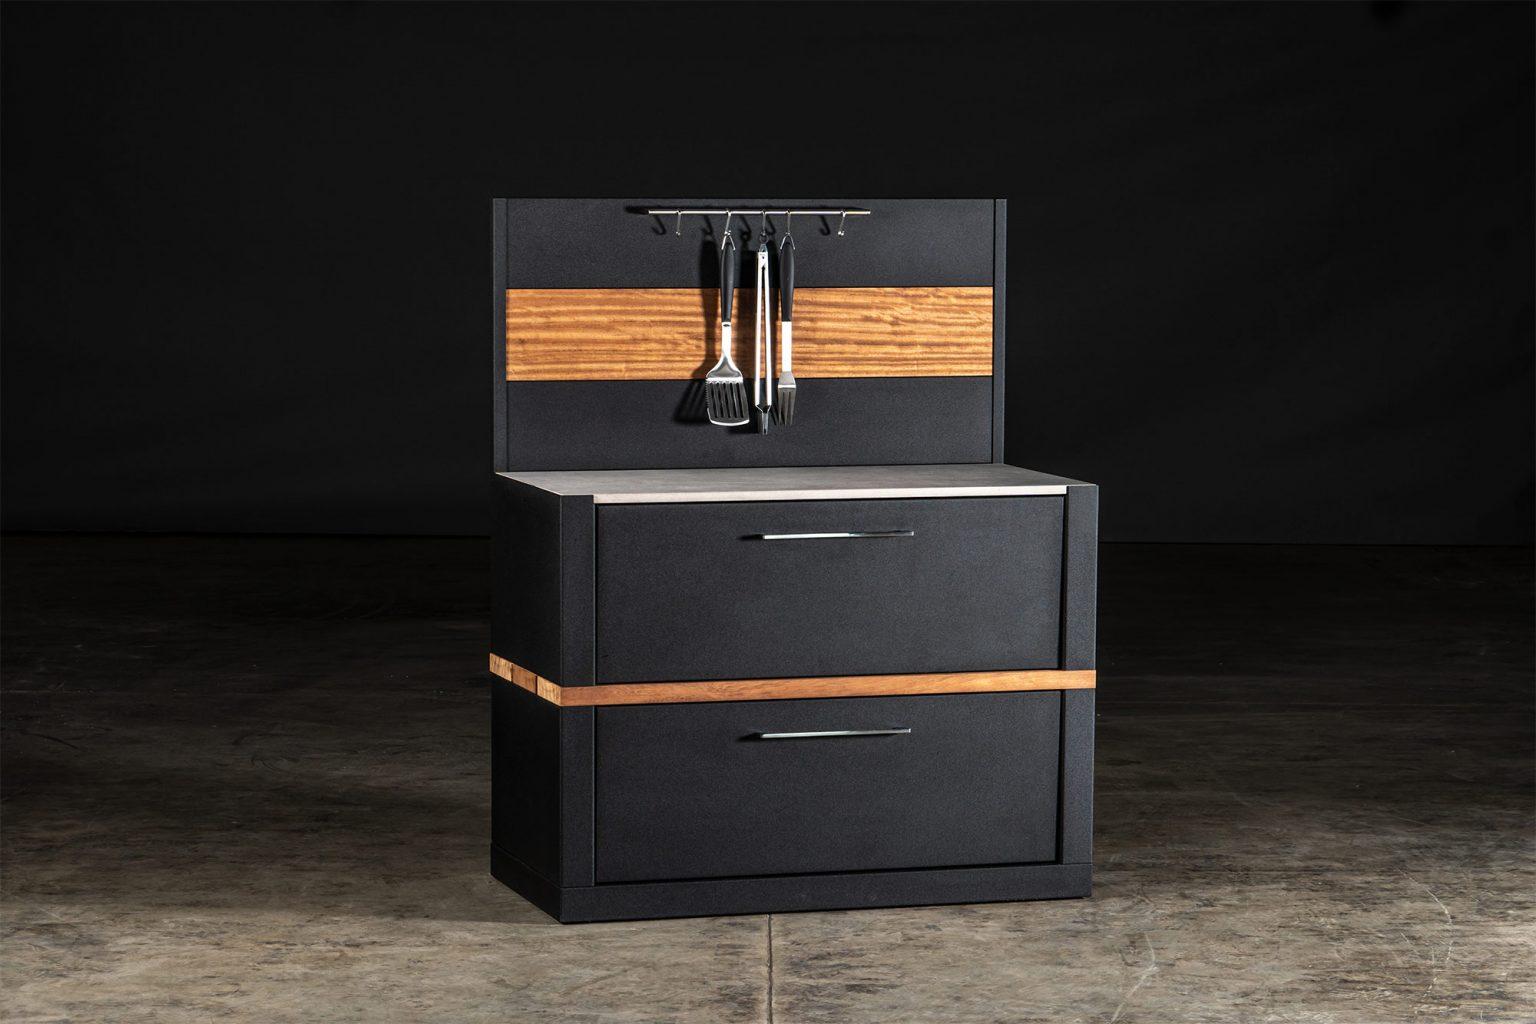 Vantage Cabinet | £1,200 - £2,180